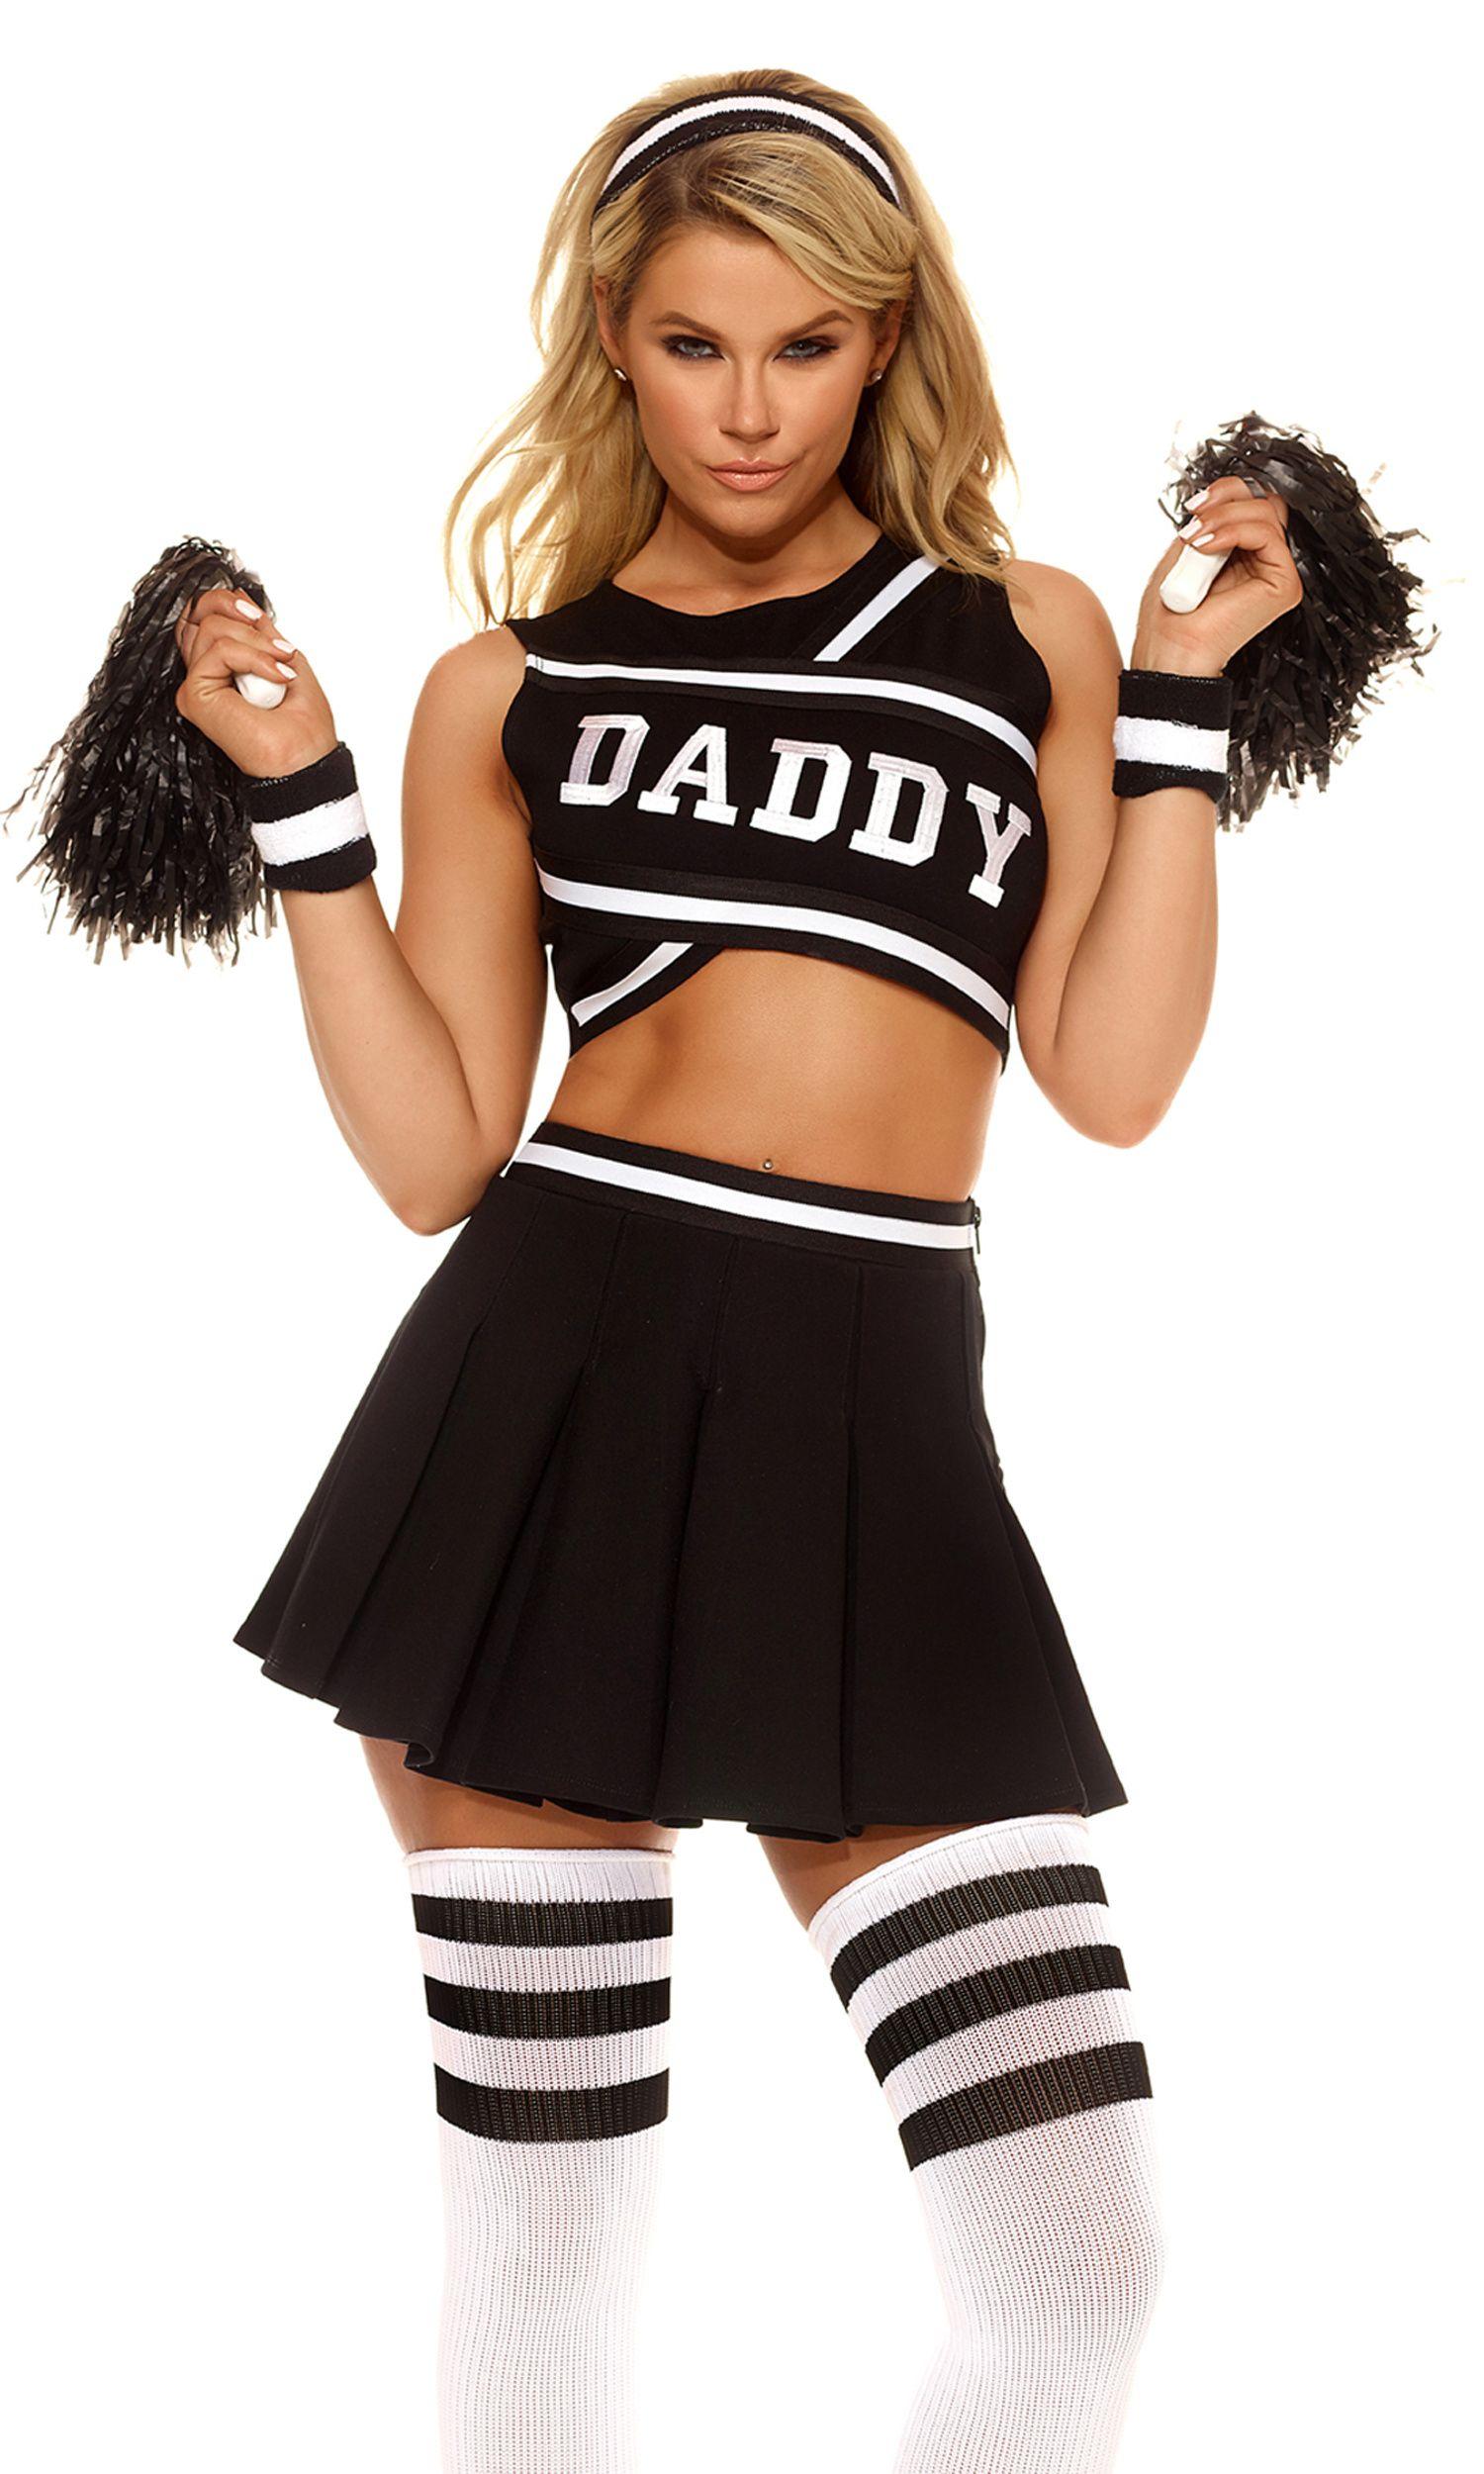 daddy s girl sexy cheerleader costume halloween more rh pinterest com